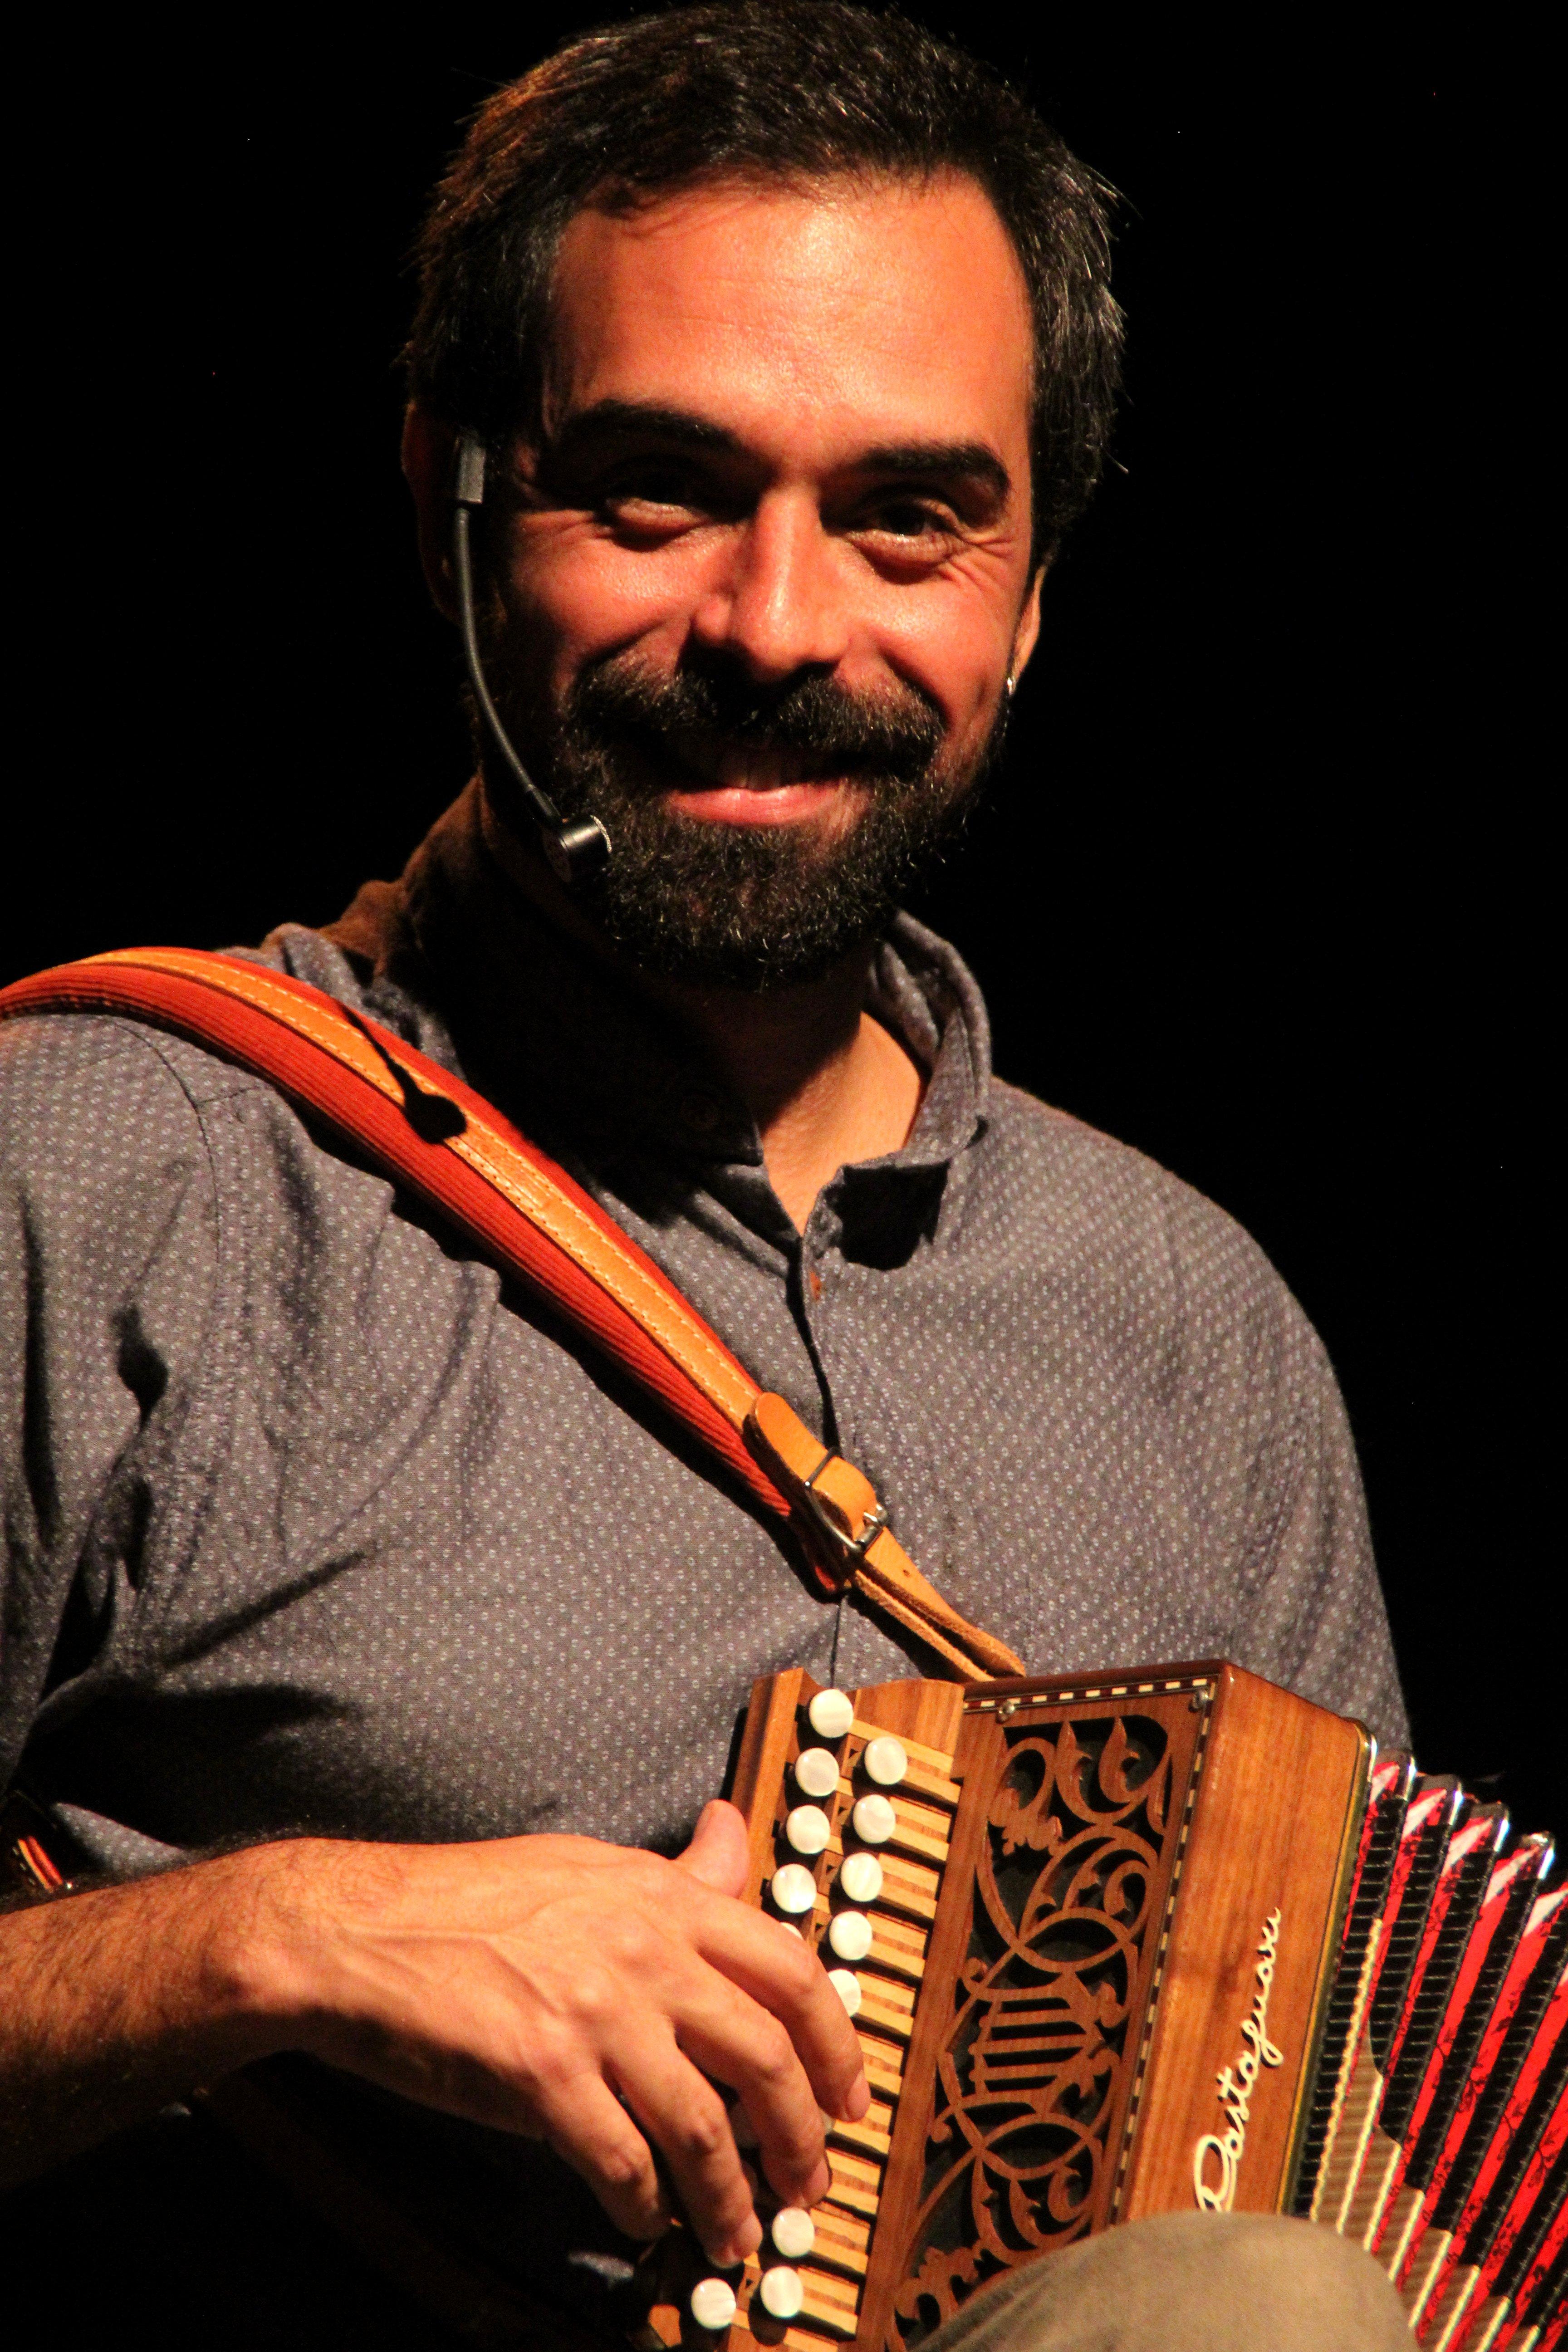 Luis Correia Carmelo